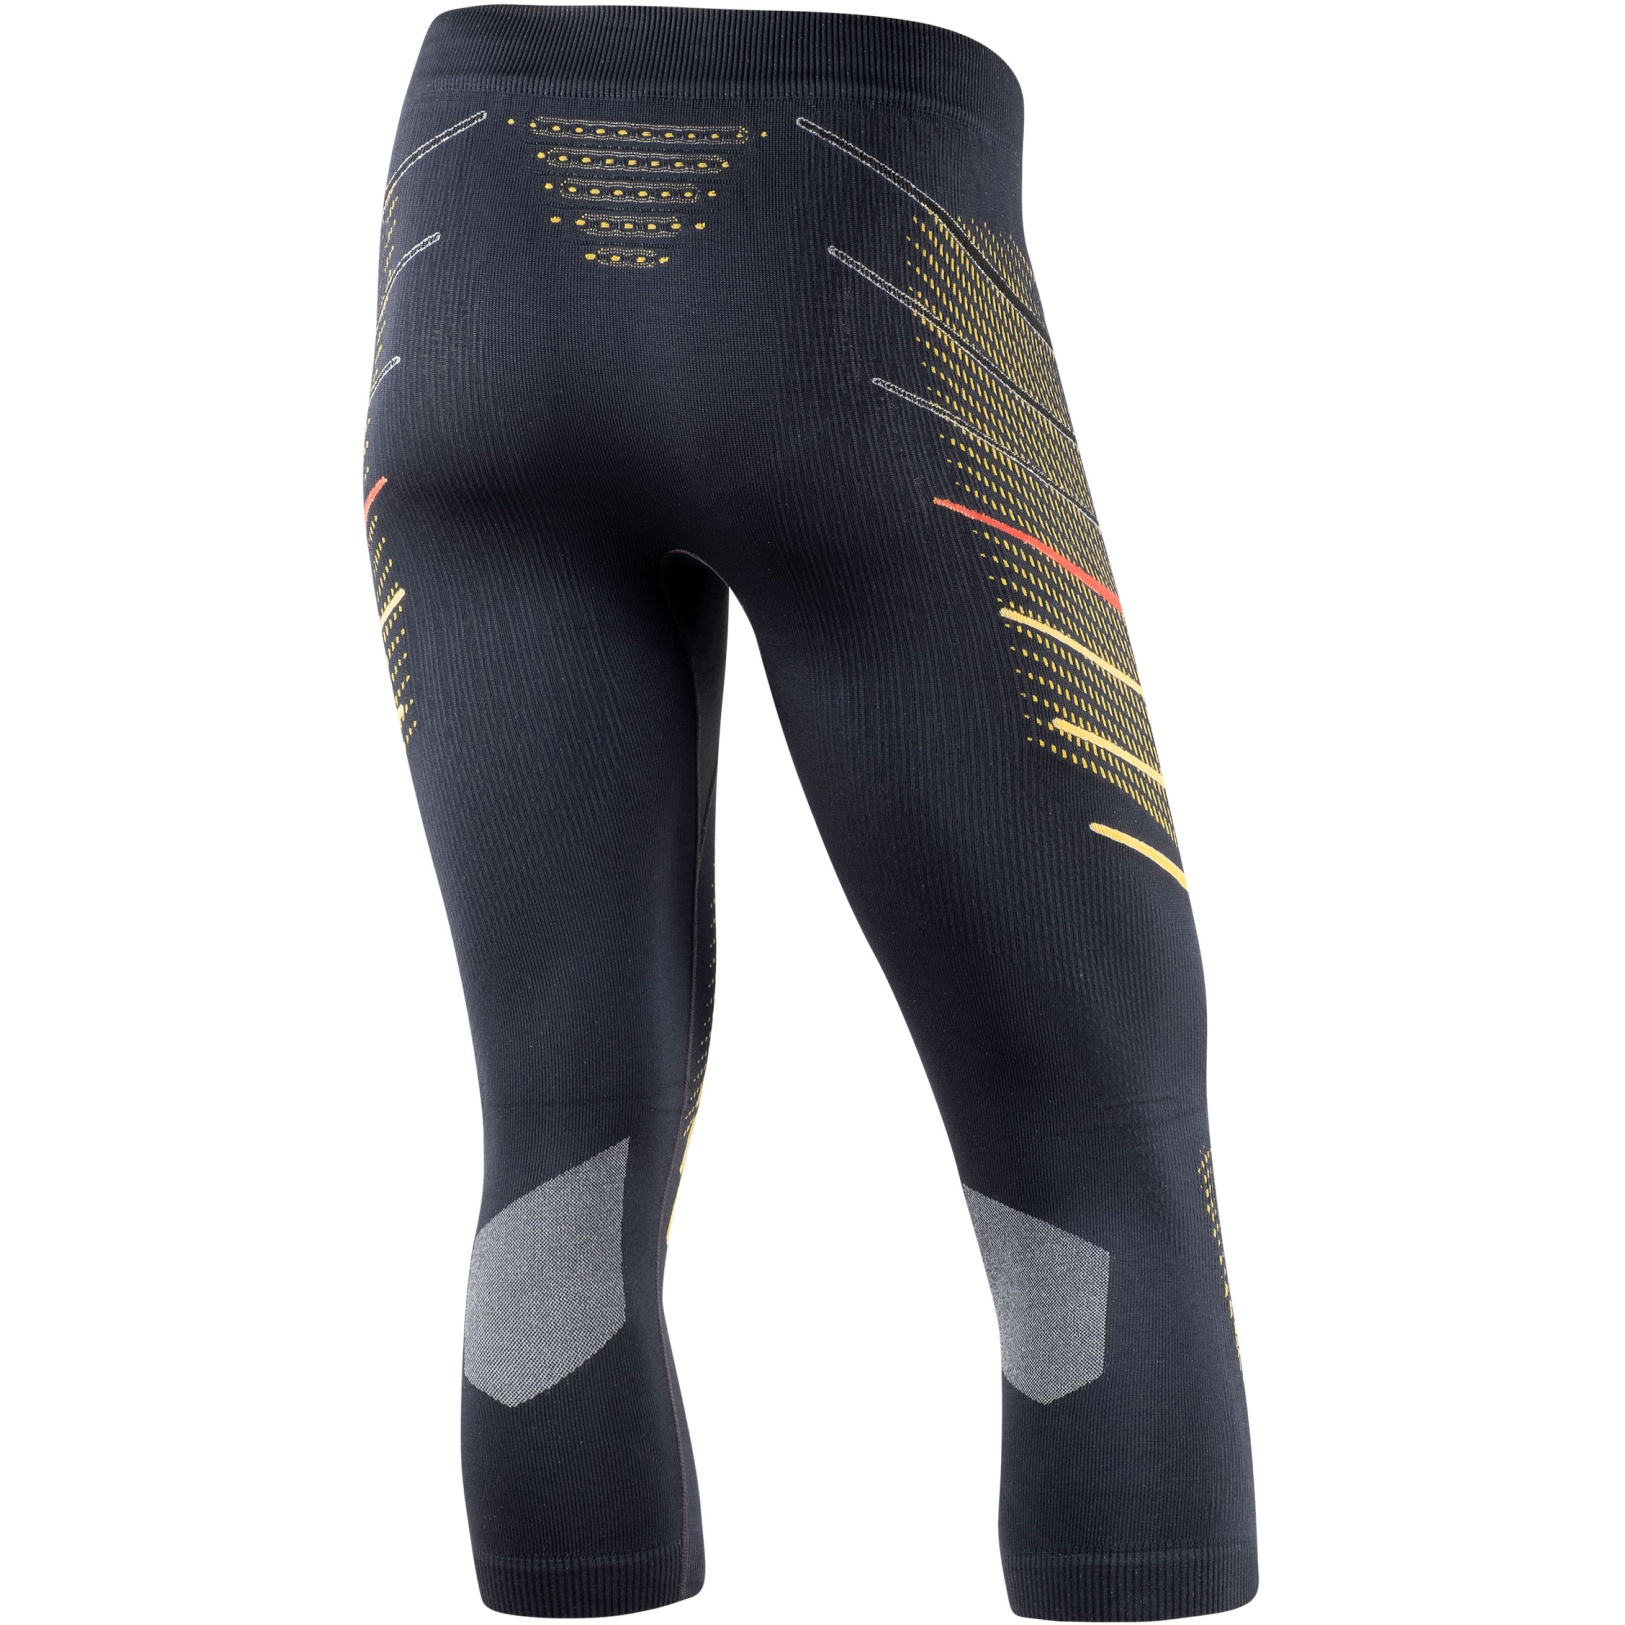 Image of UYN Natyon 2.0 Germany Underwear Pants Medium Kids - Germany